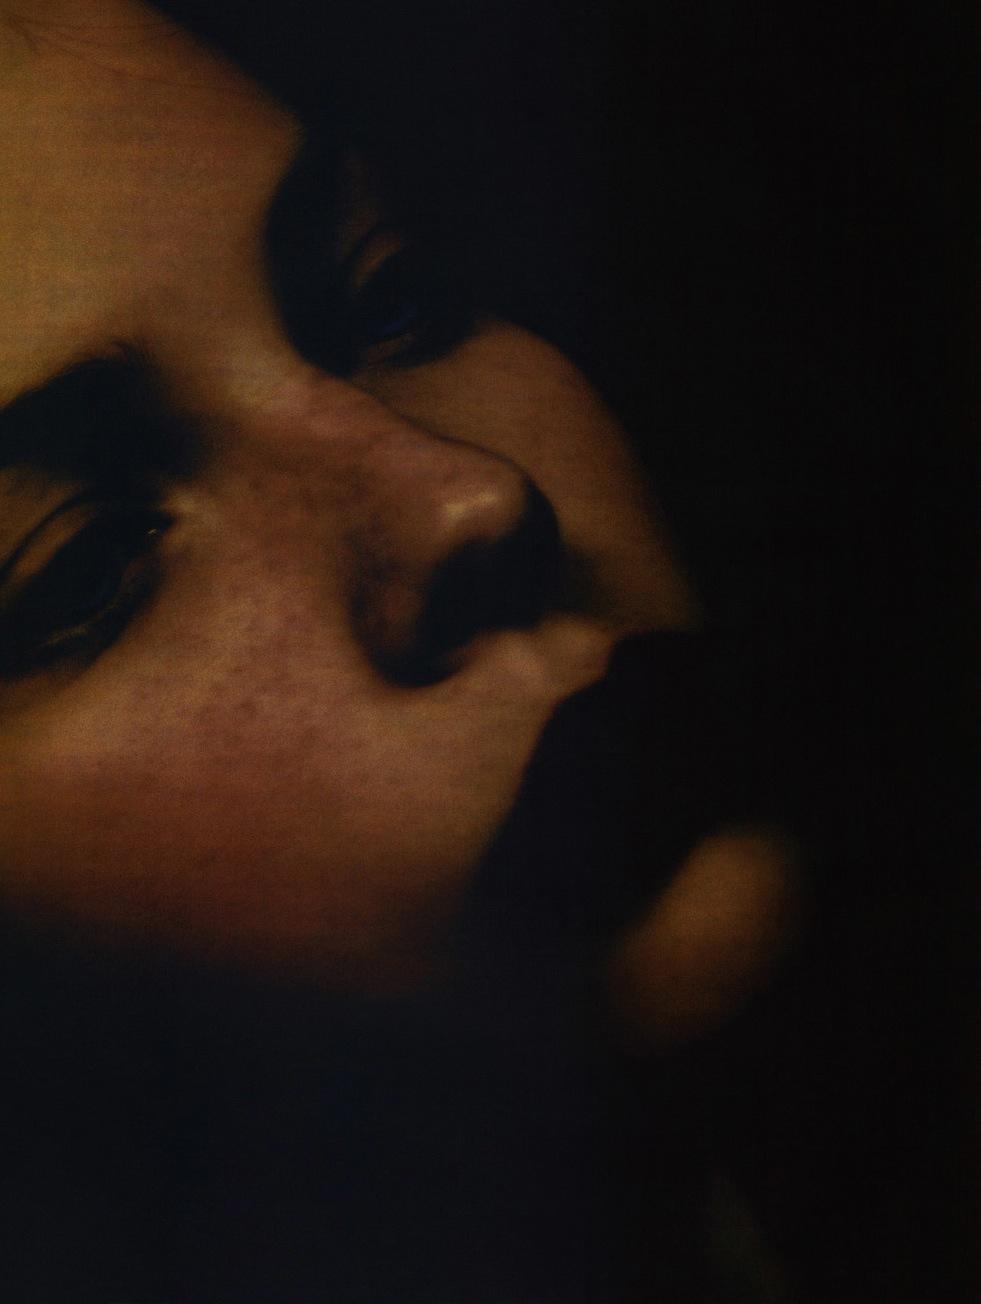 Polina_Kuklina-David_Slijper-The_Face-2004.jpeg